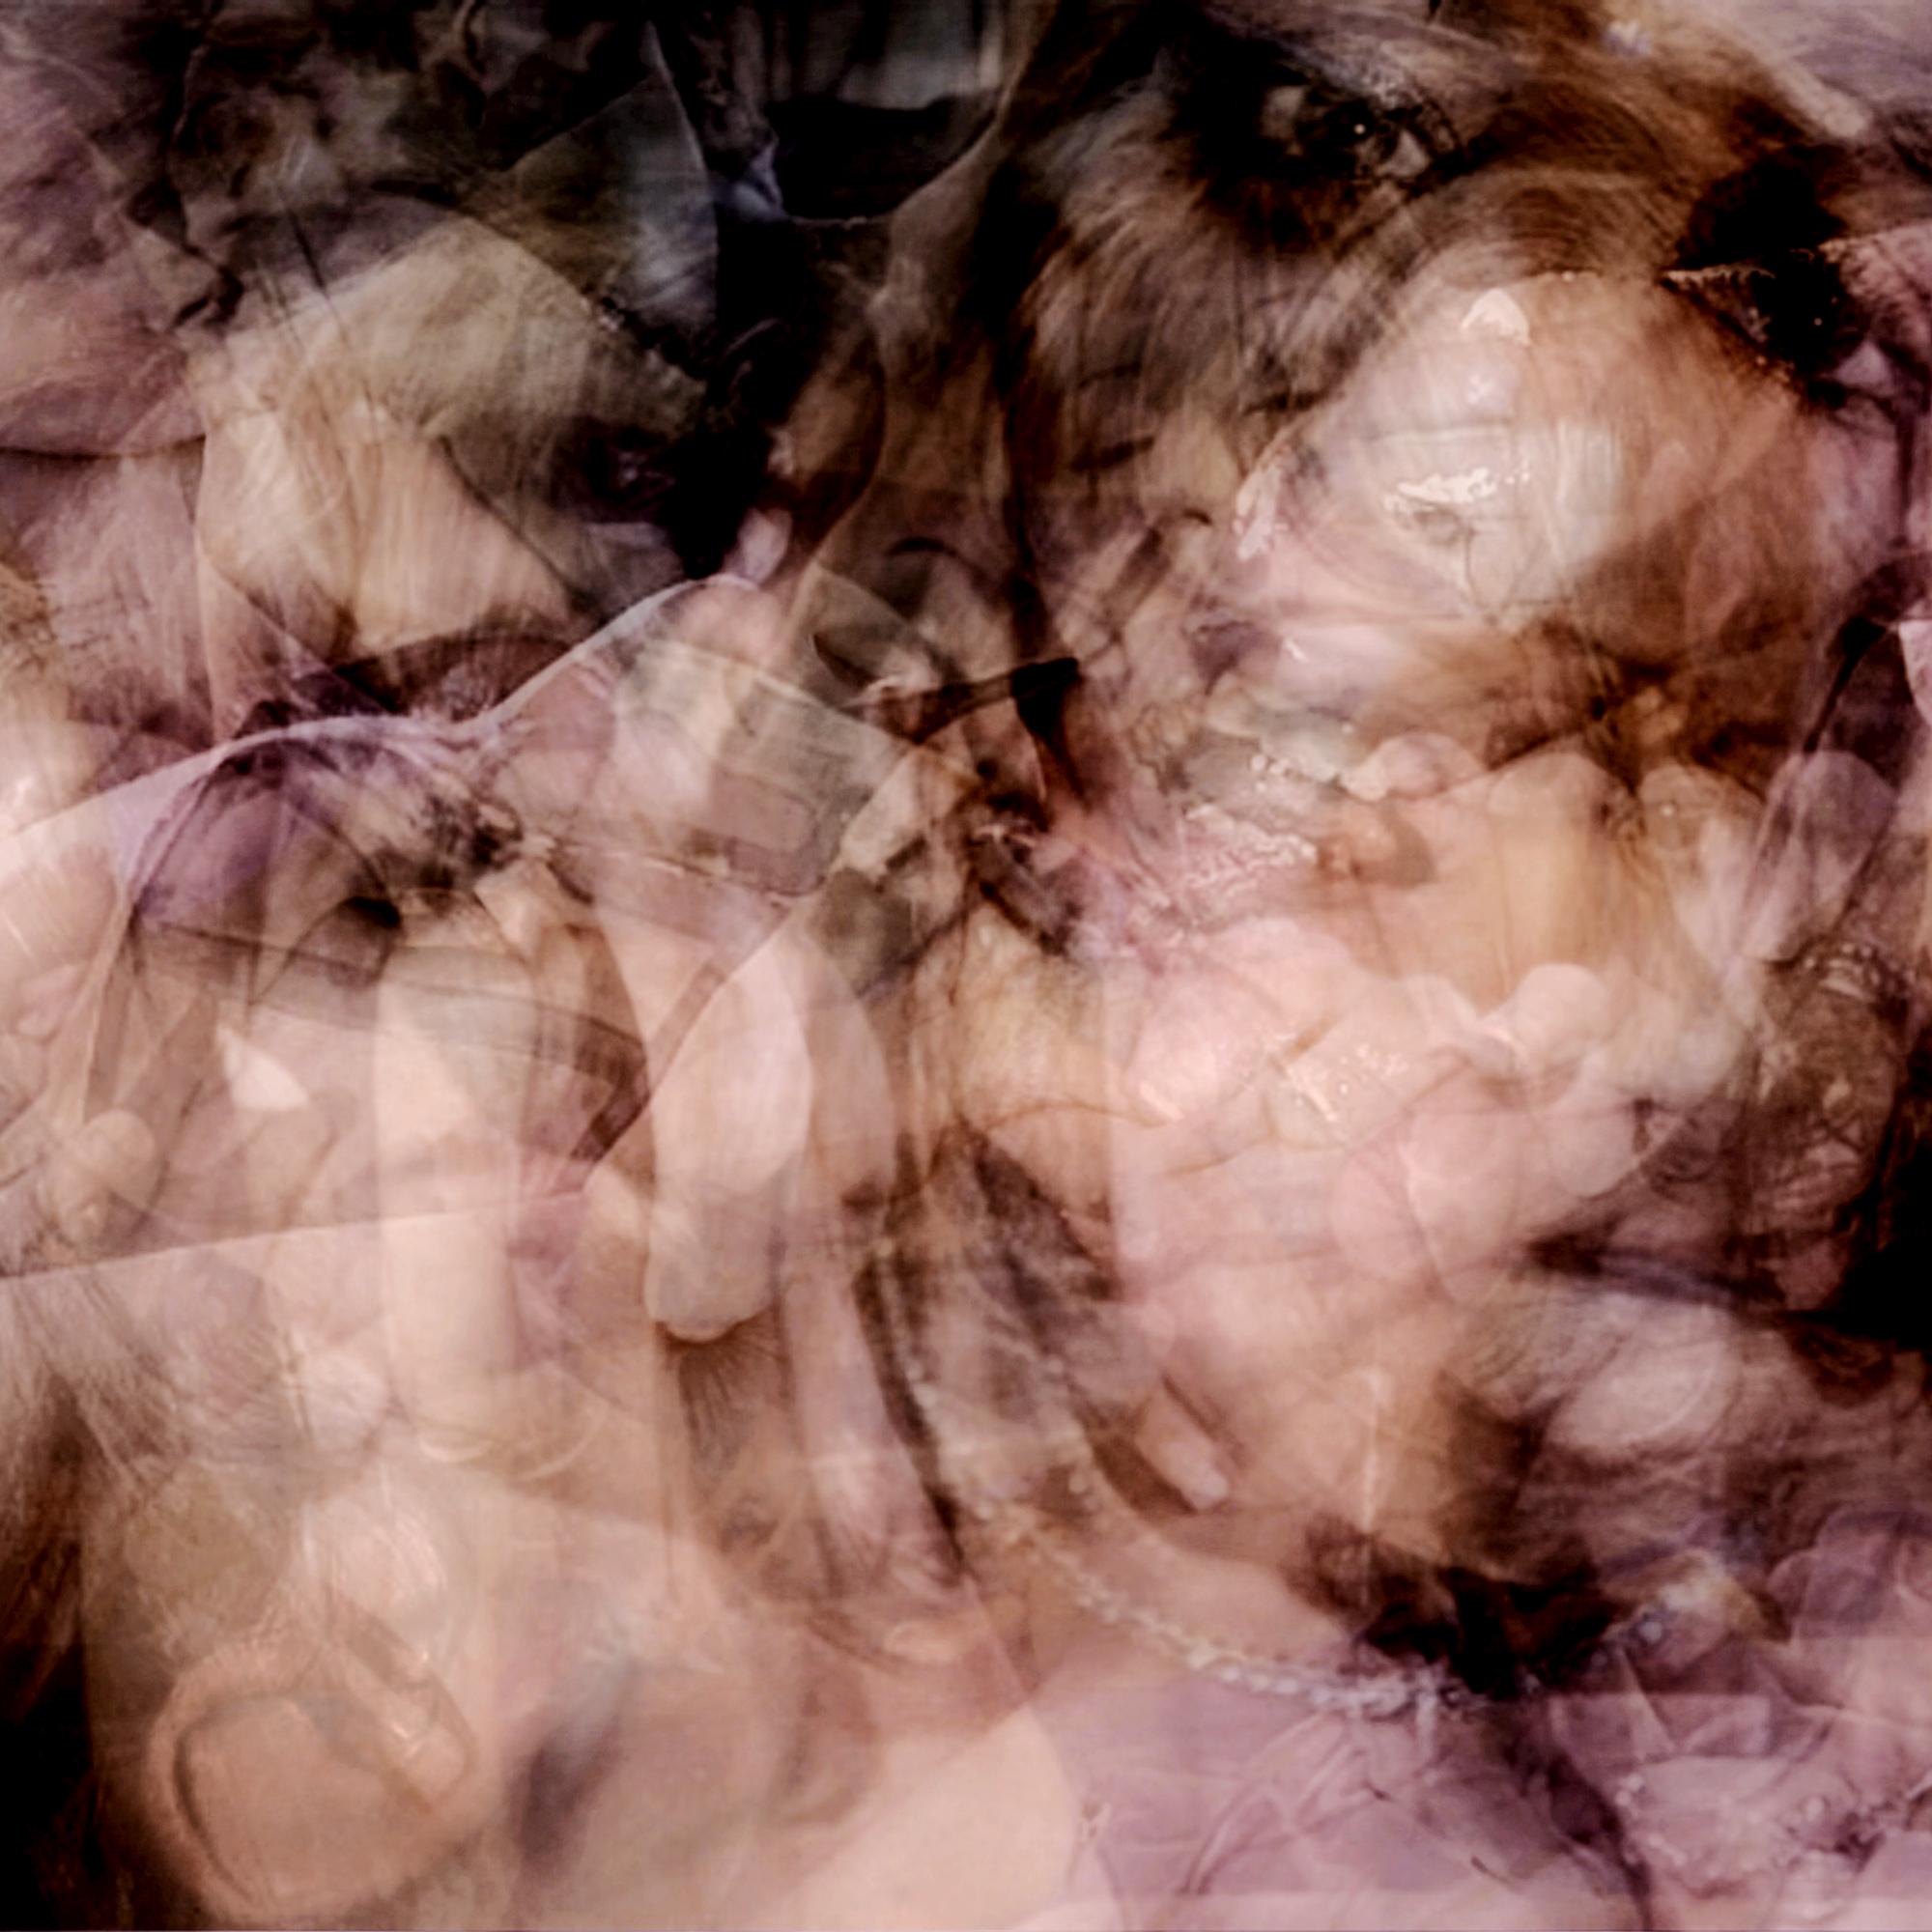 Overdose 16 (Monoptych), 2007